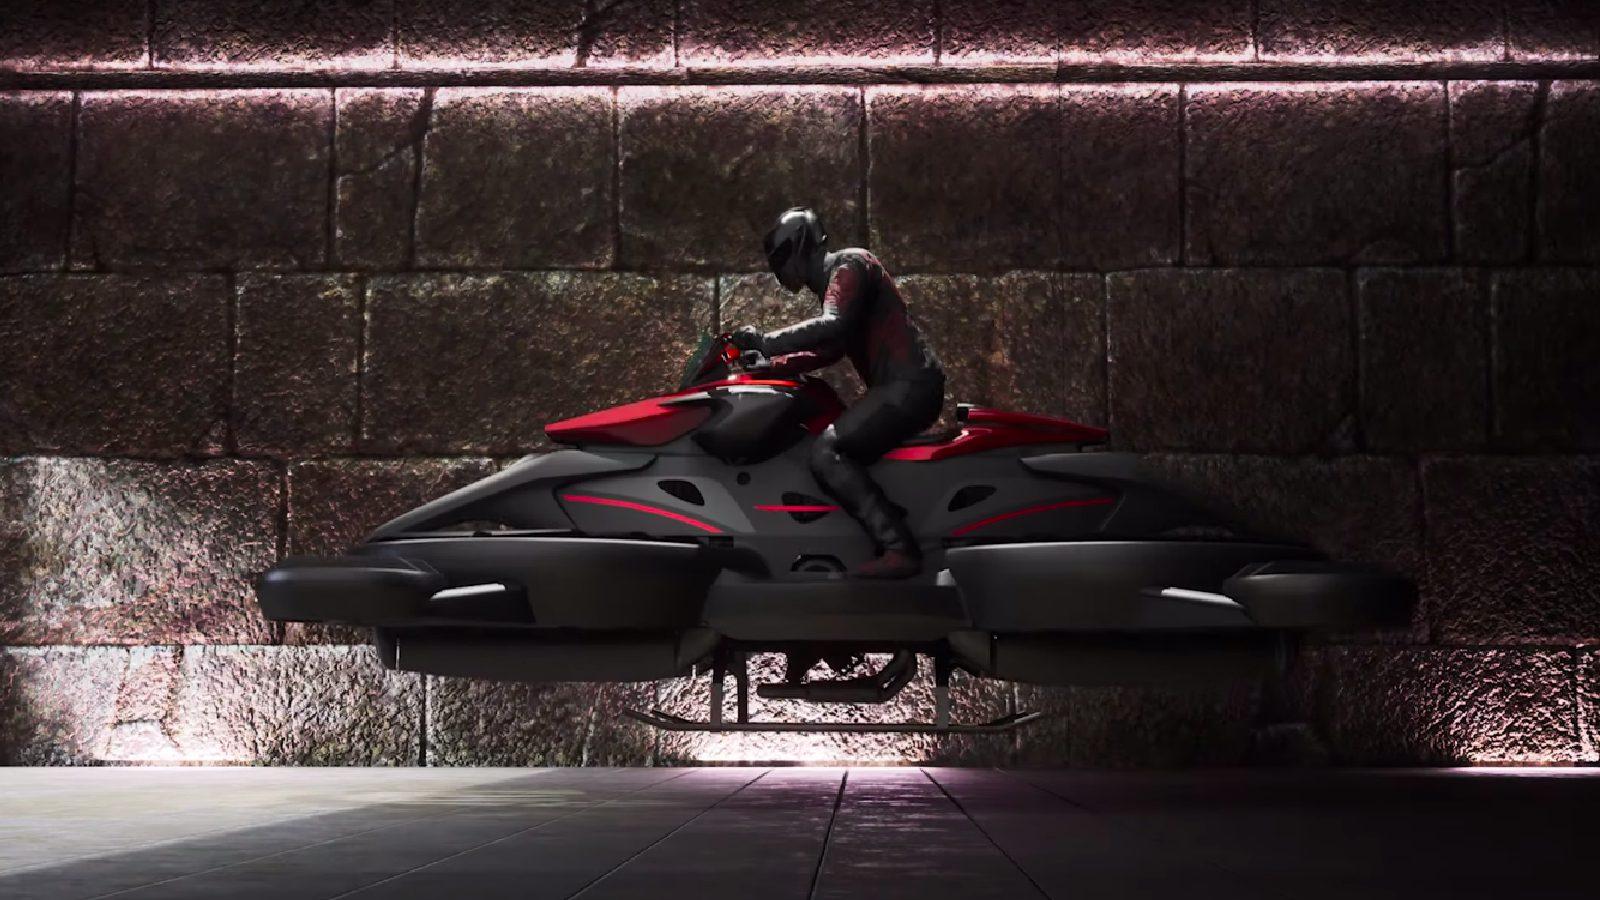 Japanese flying motorcycle